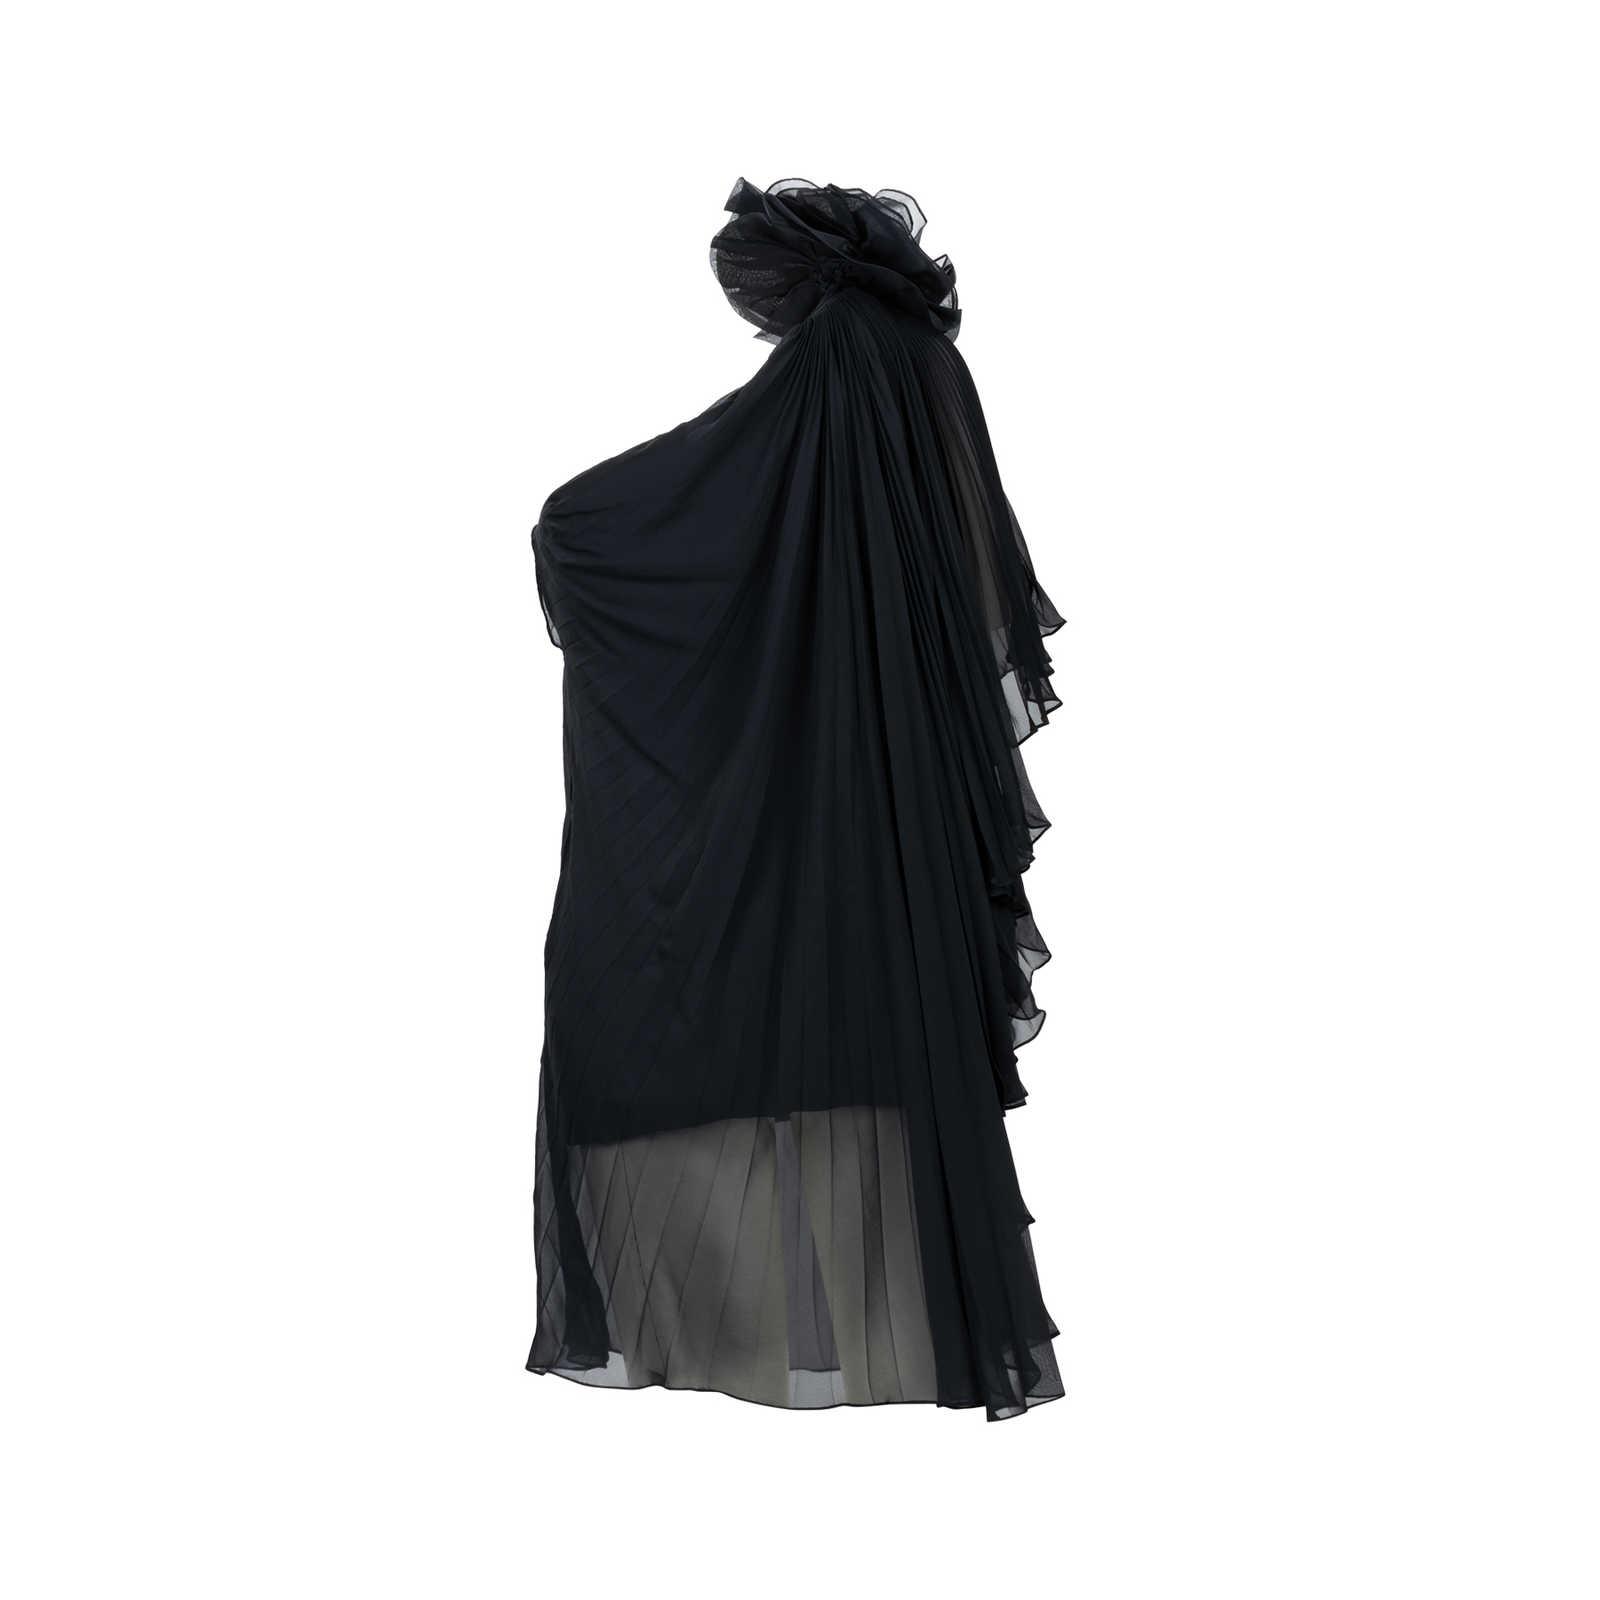 fb36a2d0dfe ... Authentic Second Hand Marchesa Notte Flower Toga Dress (PSS-565-00007)  ...